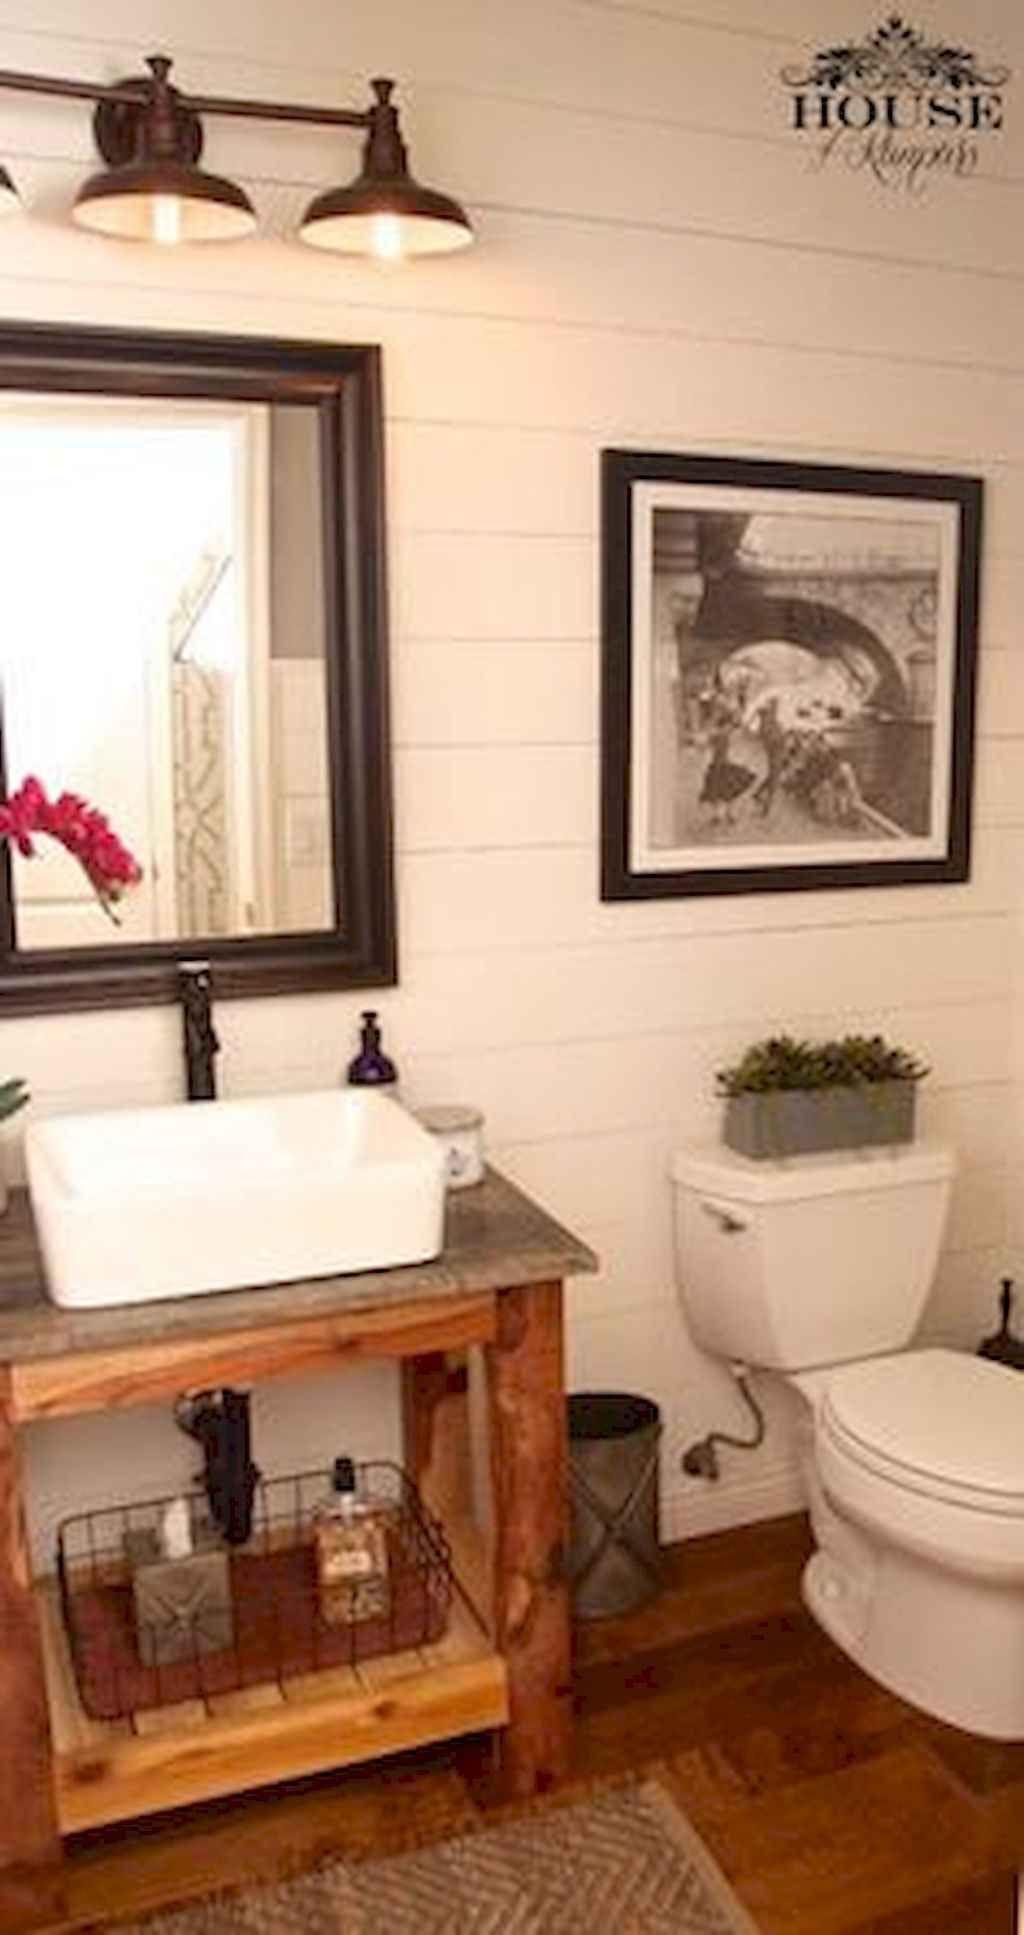 60 Cool Farmhouse Powder Room Design Ideas With Rustic